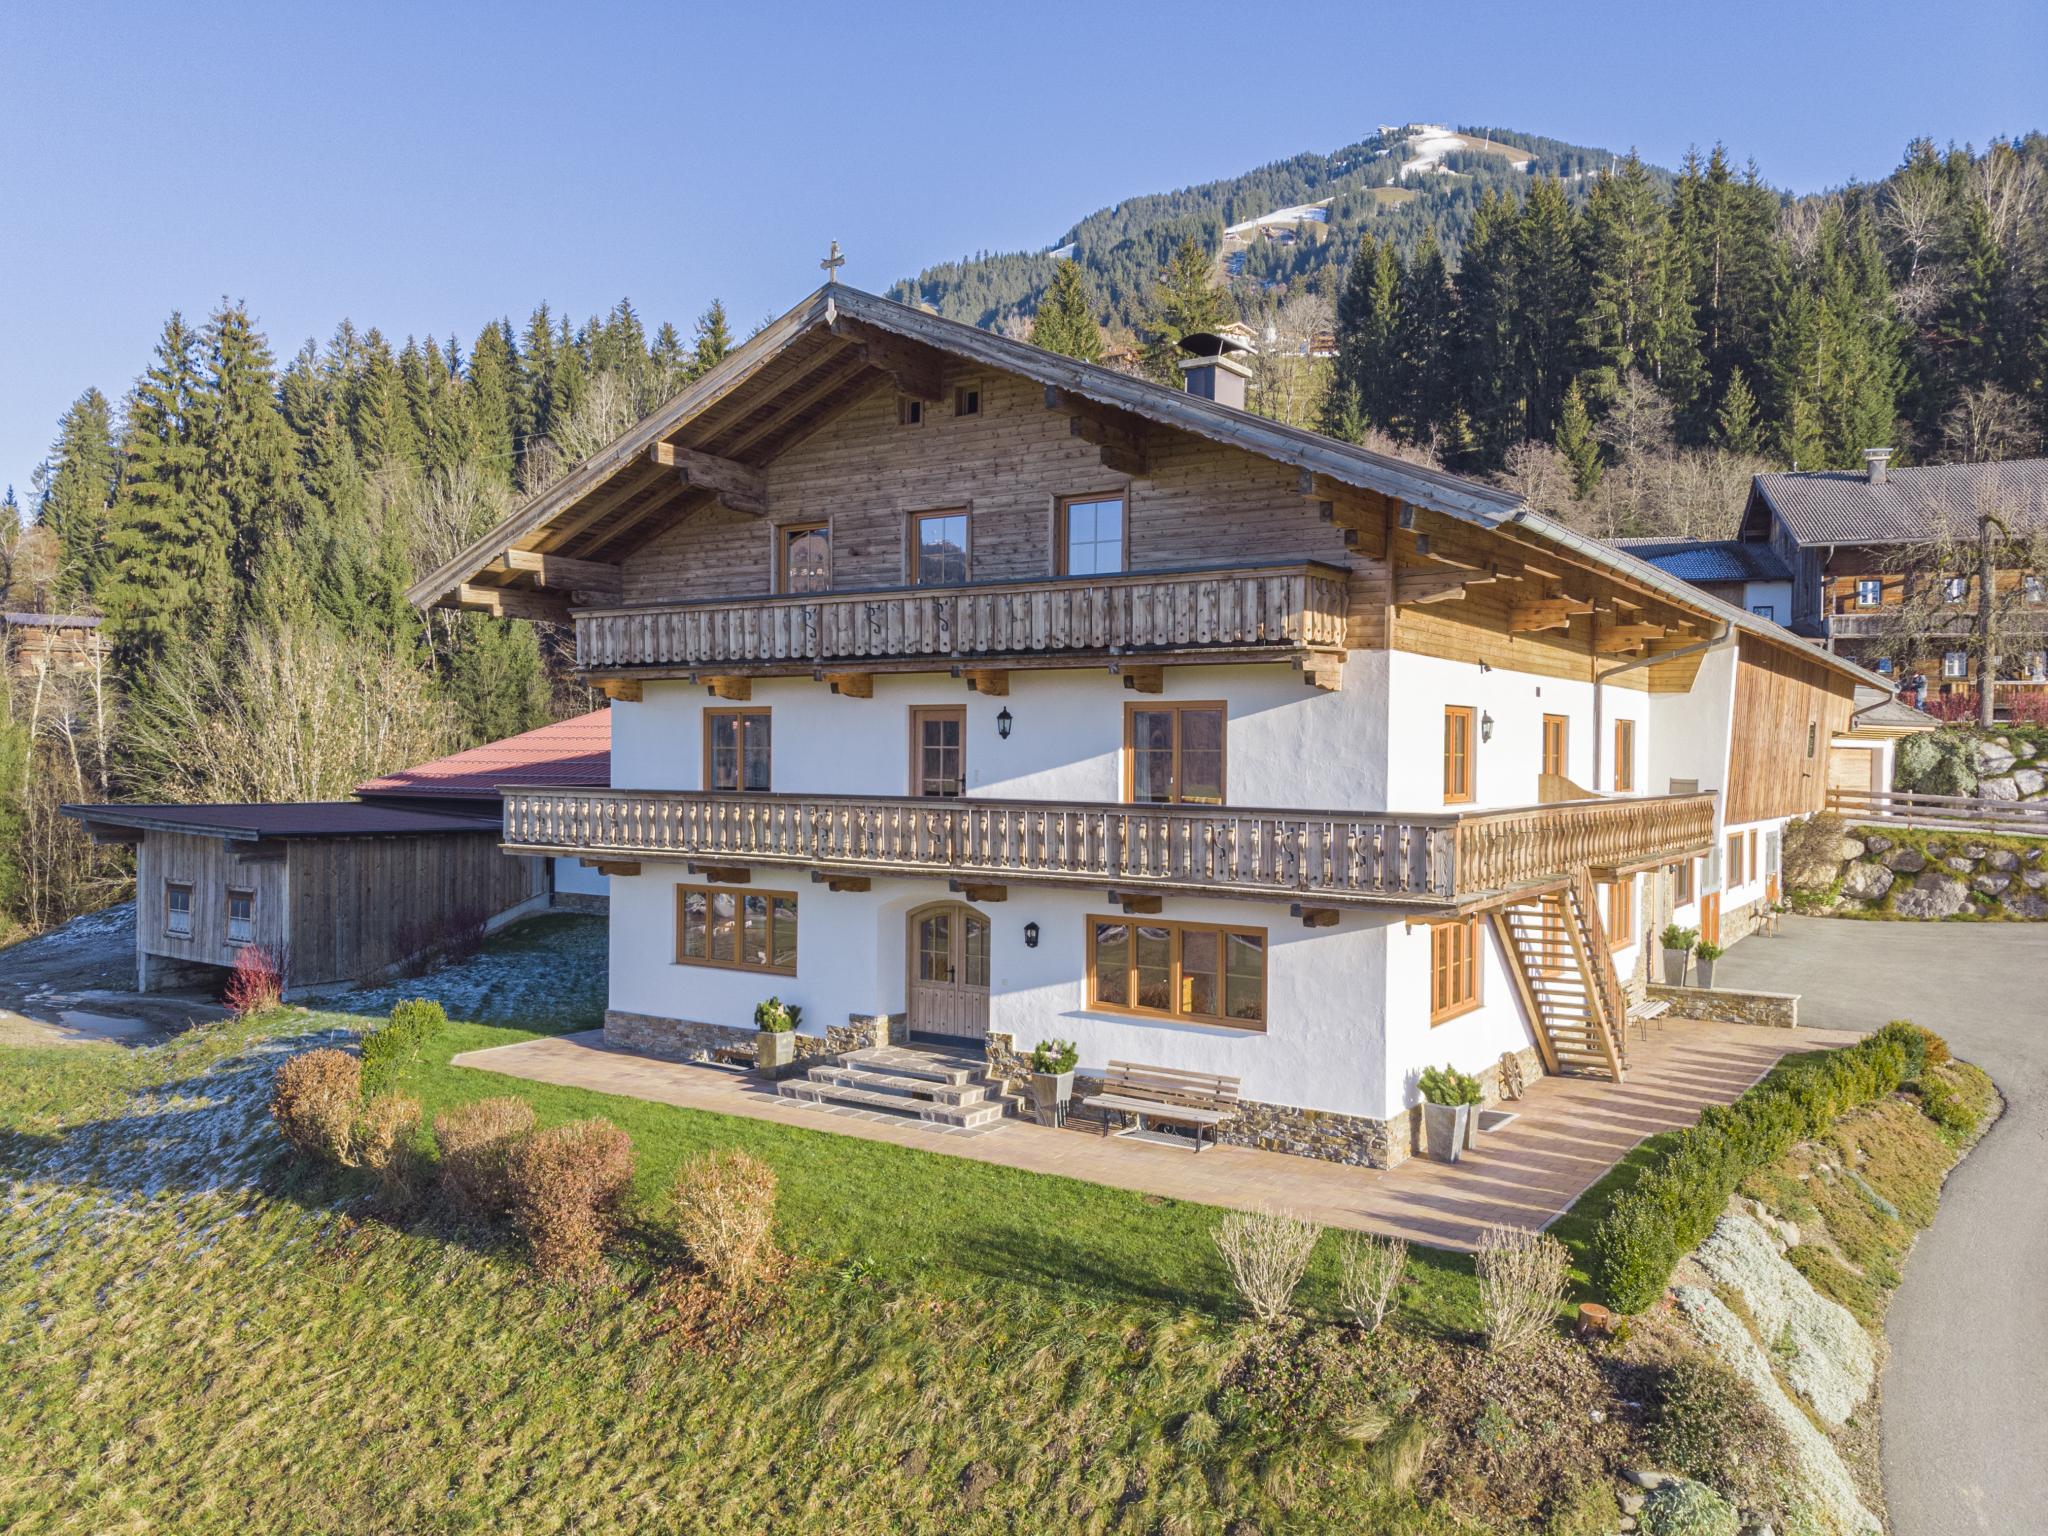 Glonersbühelhof Top 1 Tirol